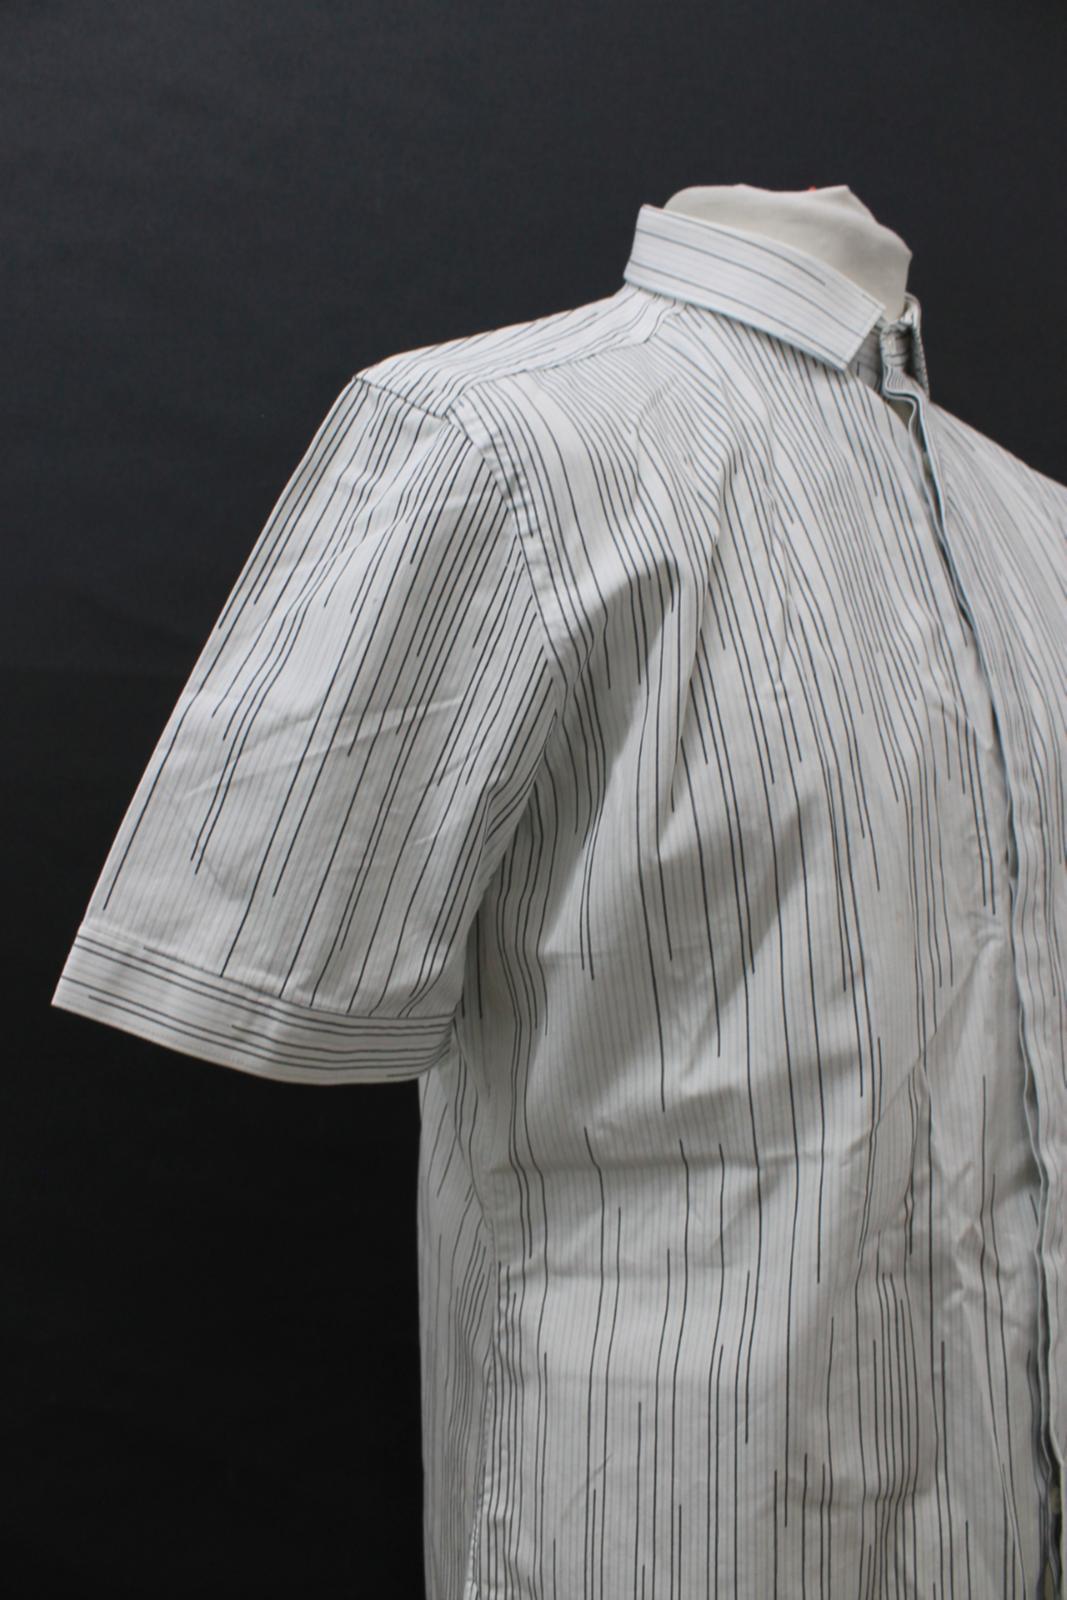 Neil-Barrett-Hombre-Blanco-Algodon-De-Rayas-Camisa-De-Manga-Corta-Estampado-de-bolsillo-16-5-034 miniatura 8